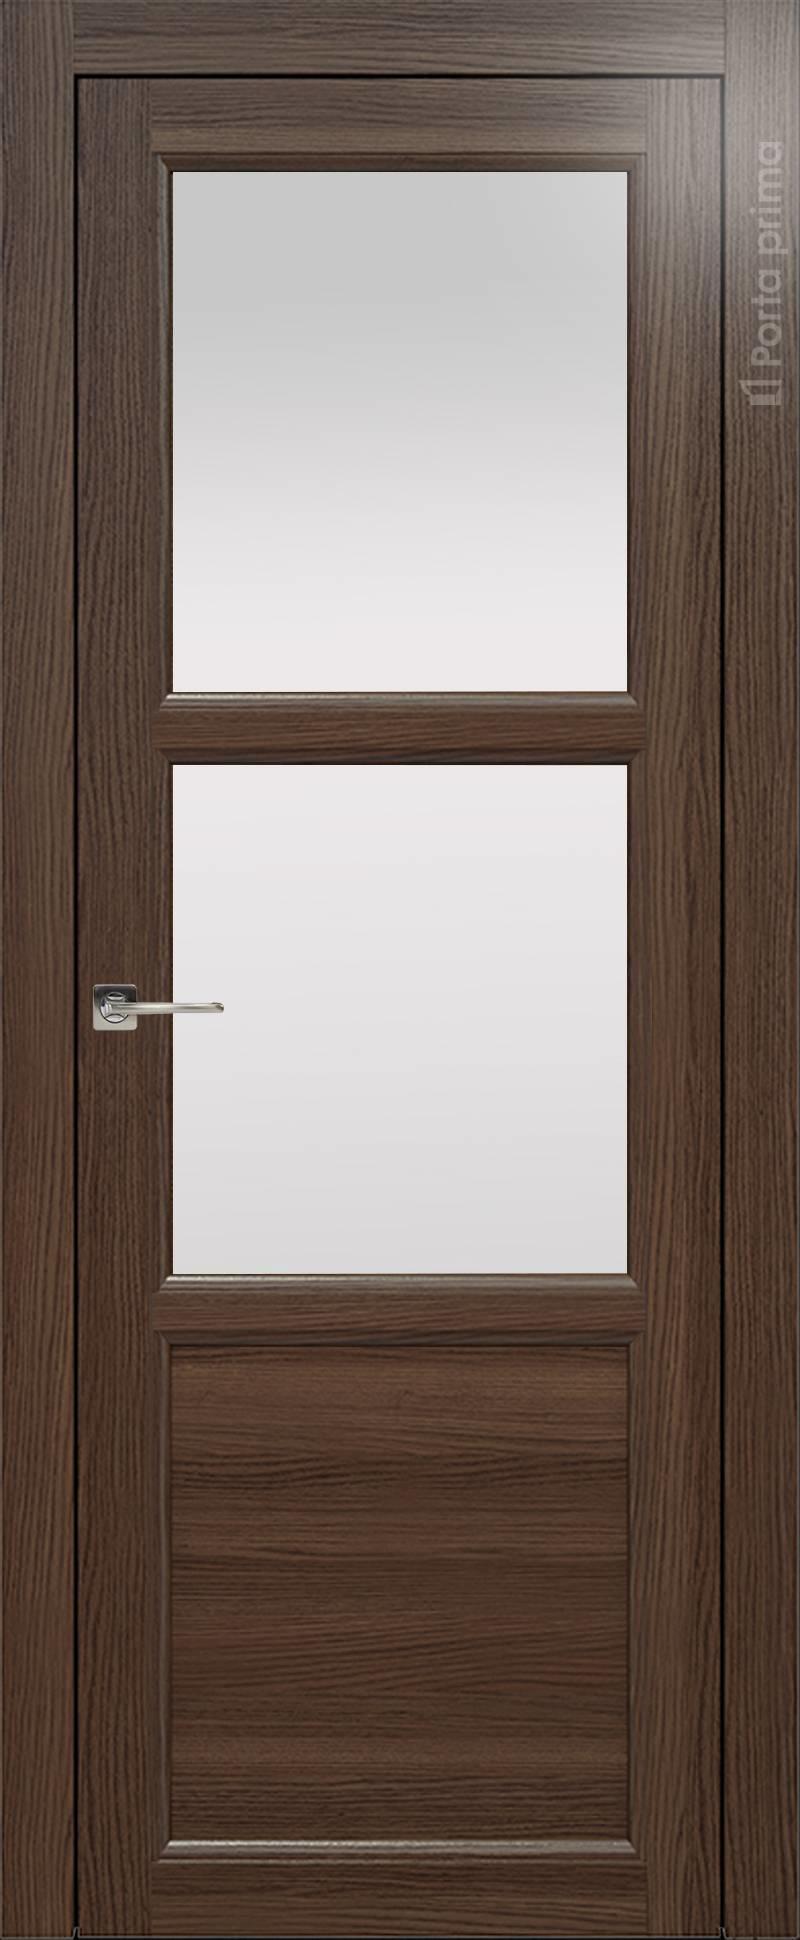 Sorrento-R Б2 цвет - Дуб торонто Со стеклом (ДО)